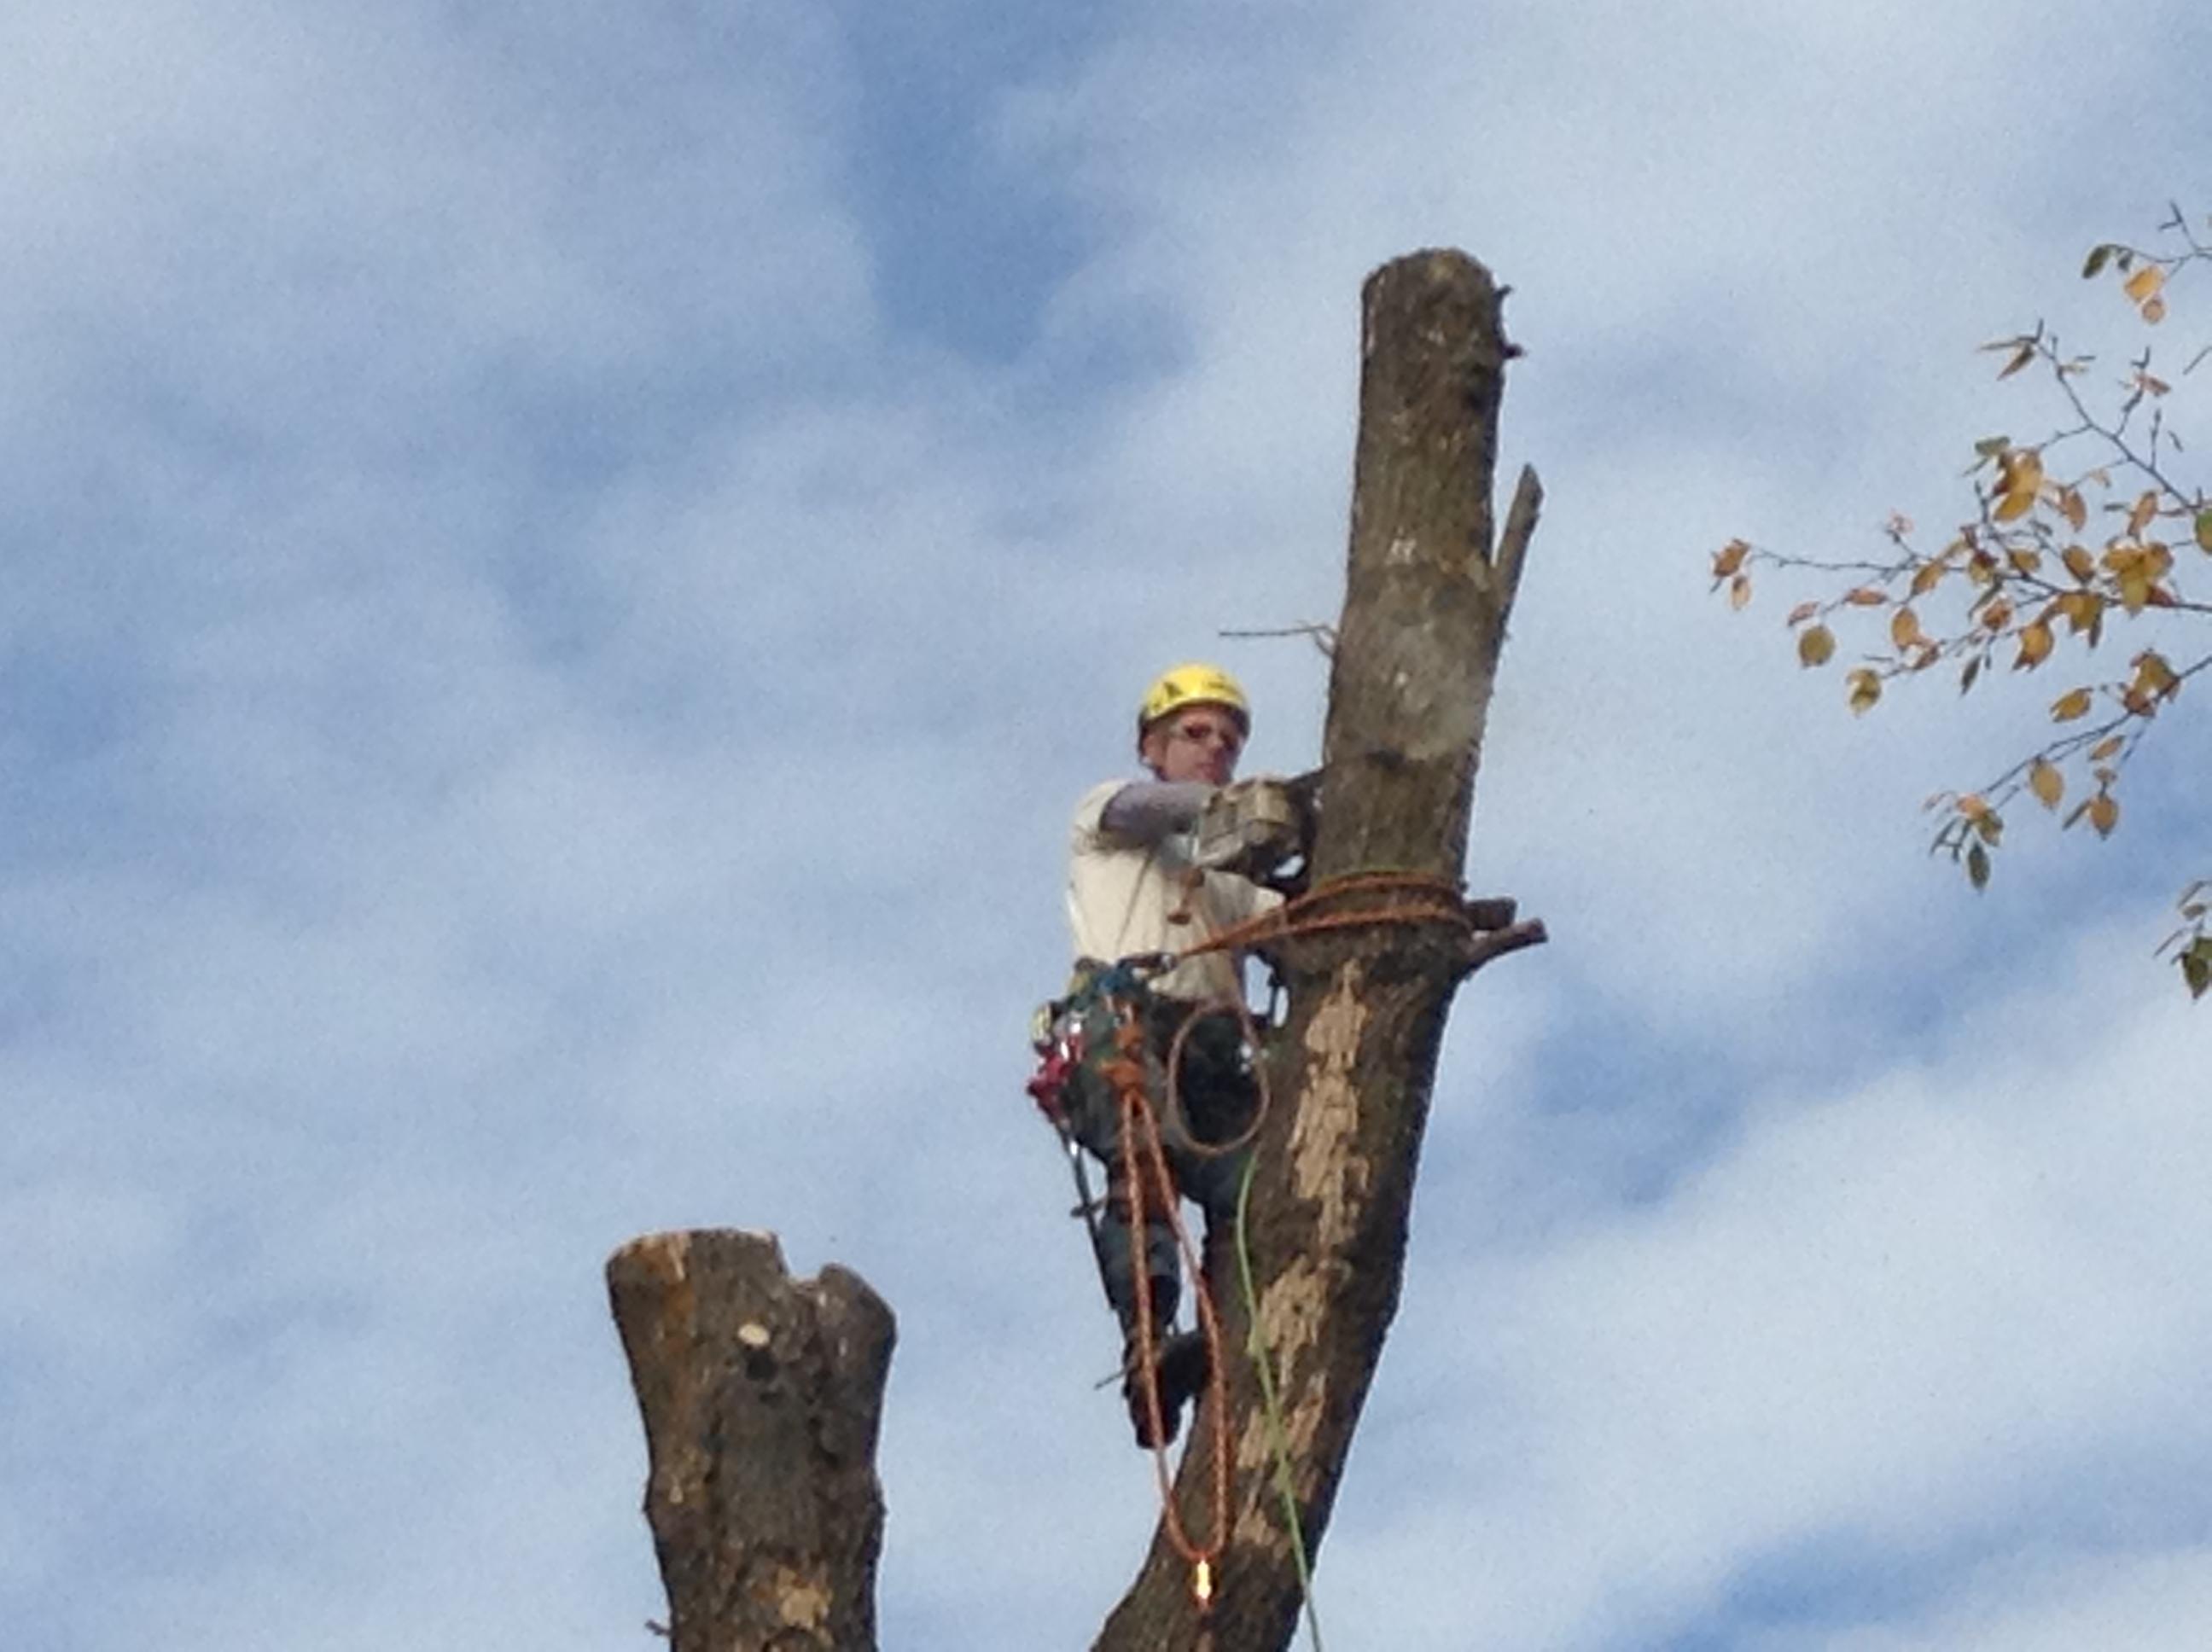 Arborist, Tree Service - Img 0406